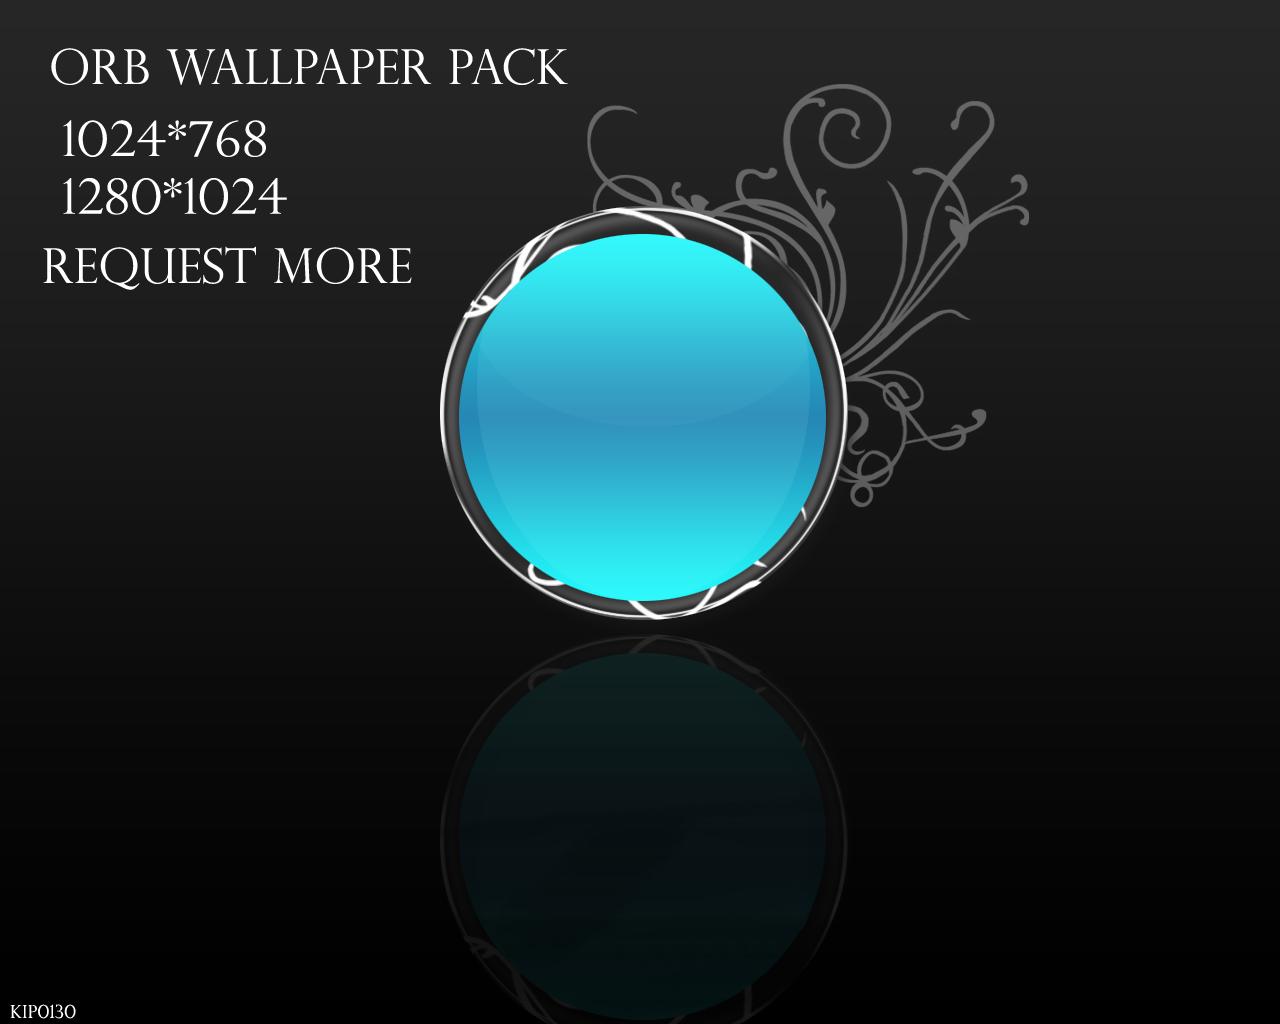 Orb wallpaper pack by Kip0130 on deviantART 1280x1024